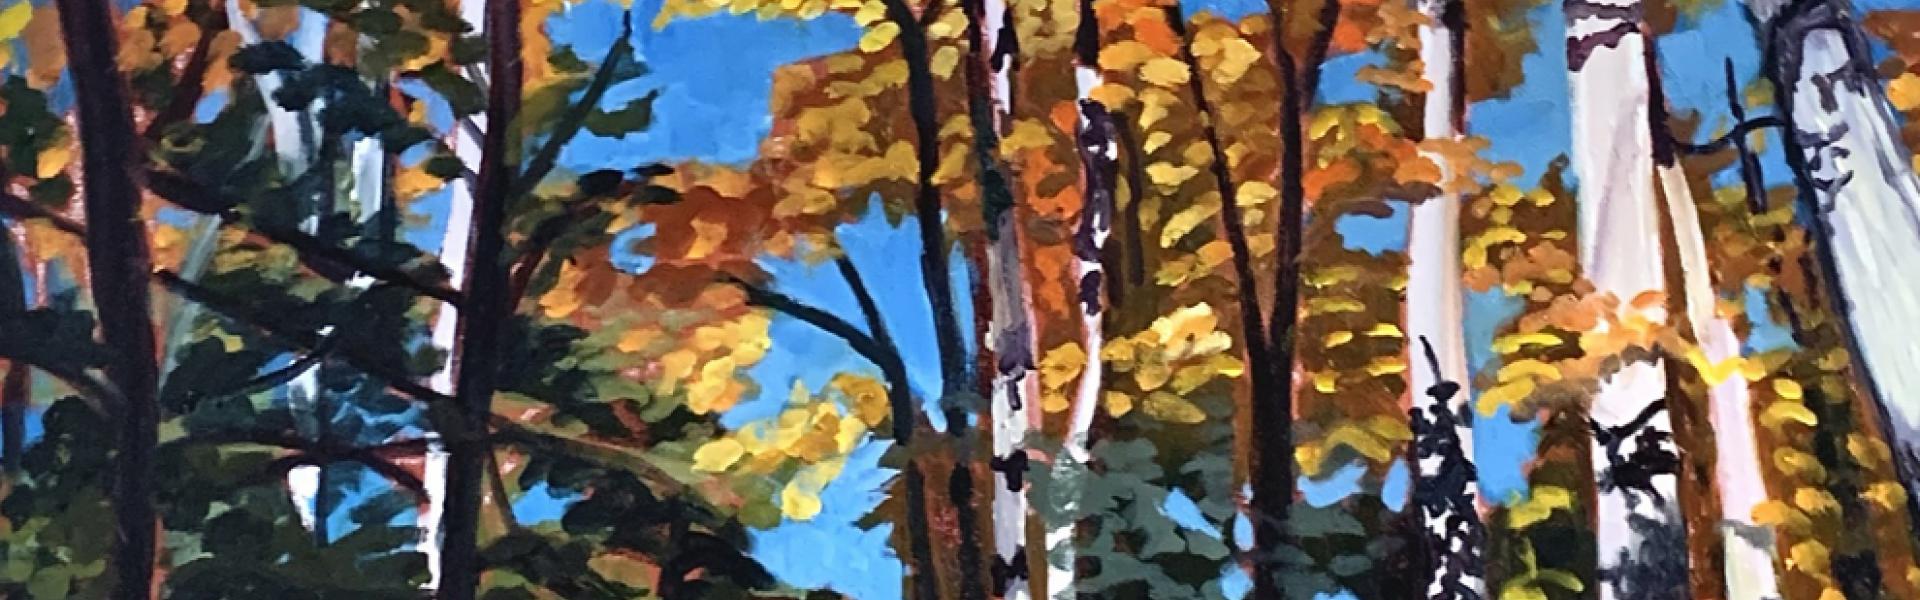 banner_Lynne-Ryall-Looking-Up-Crawford-Lake-2020-small-piece.20210520215342.jpg